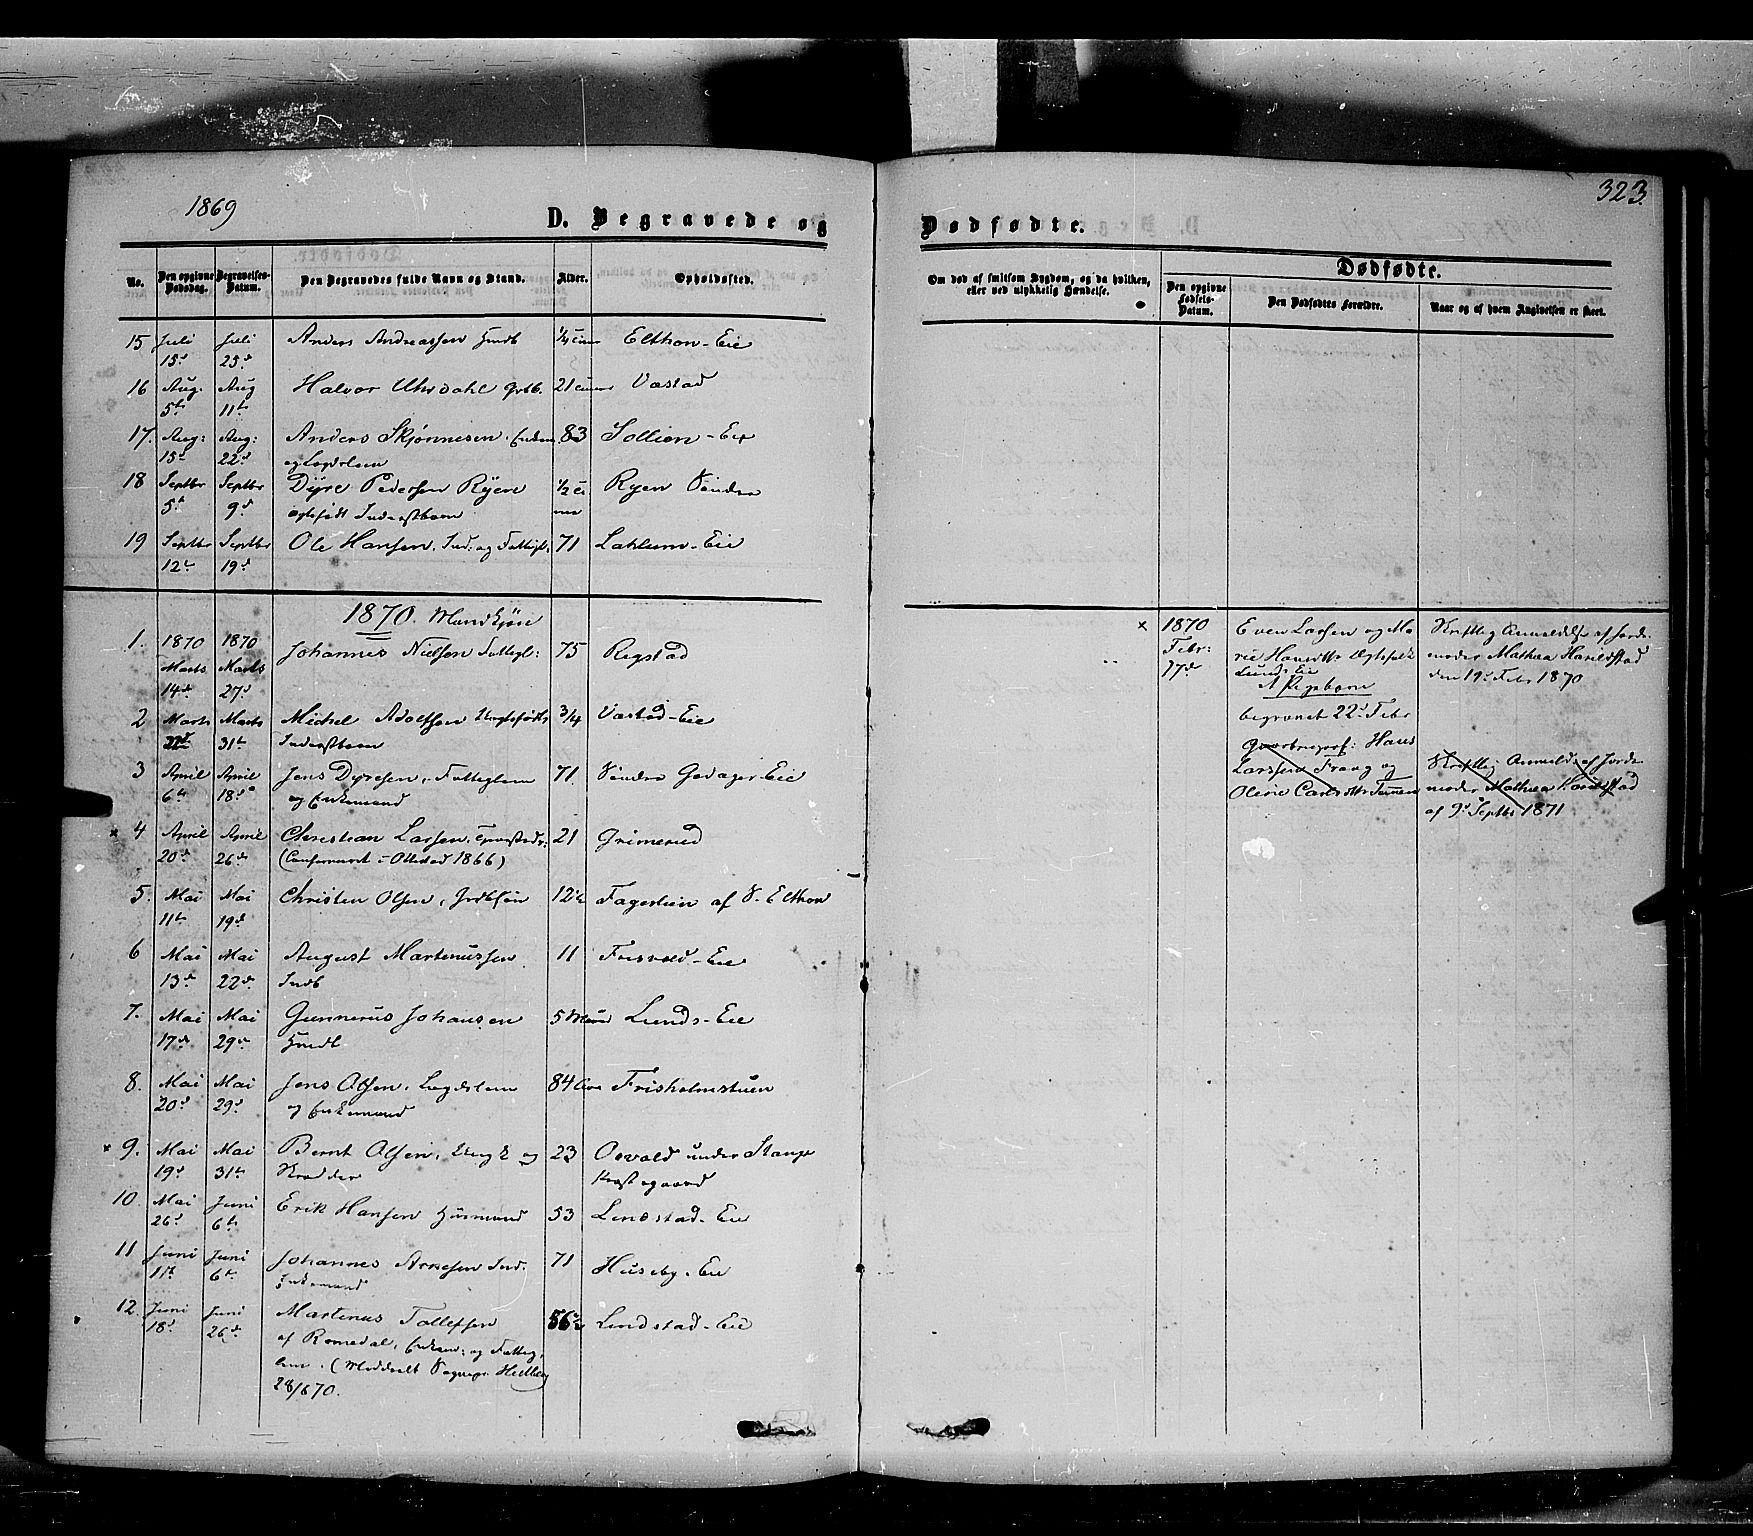 SAH, Stange prestekontor, K/L0013: Ministerialbok nr. 13, 1862-1879, s. 323